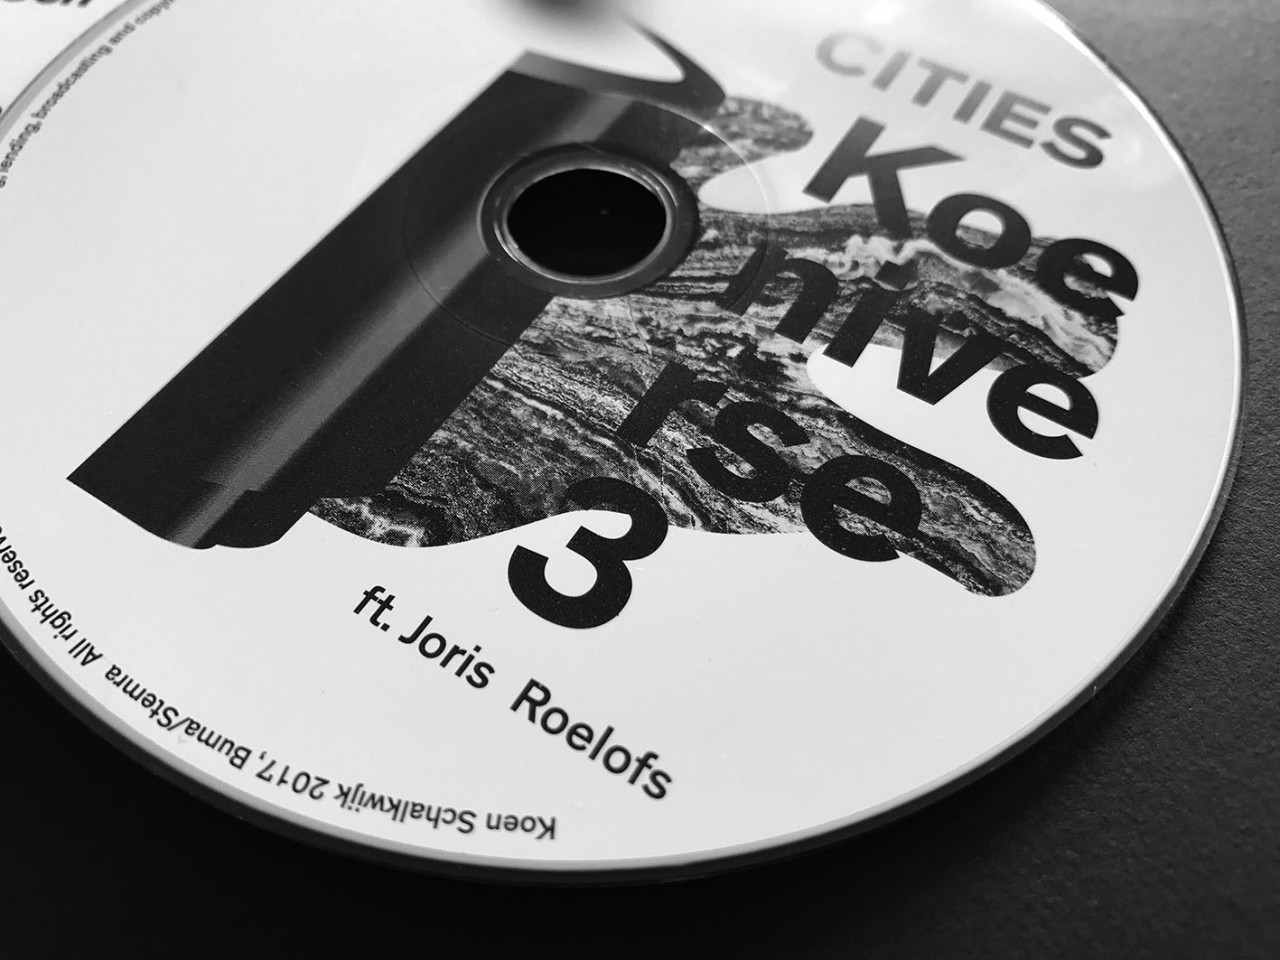 Studio Kat Rahmani ۳آلبوم موسیقی کانیورس  Music Album Koeniverse 3